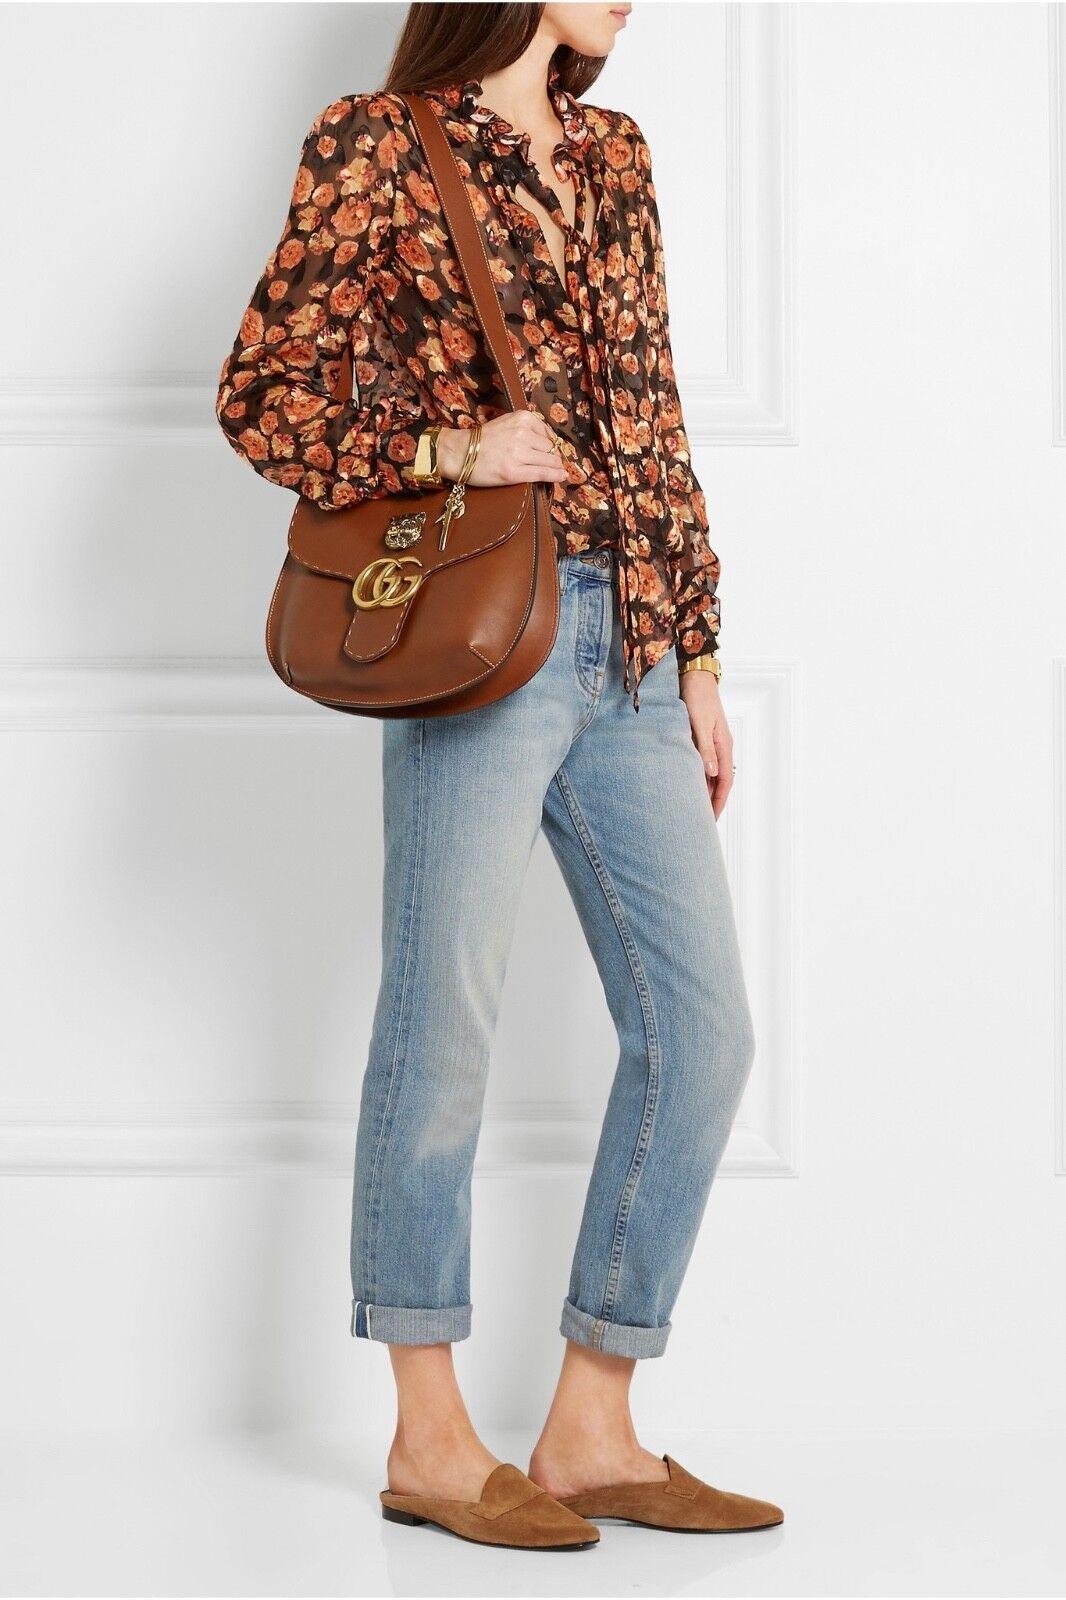 d6f545e53284 Gucci Animalier GG Marmont Leather Shoulder Bag Brown Tiger Handbag ...